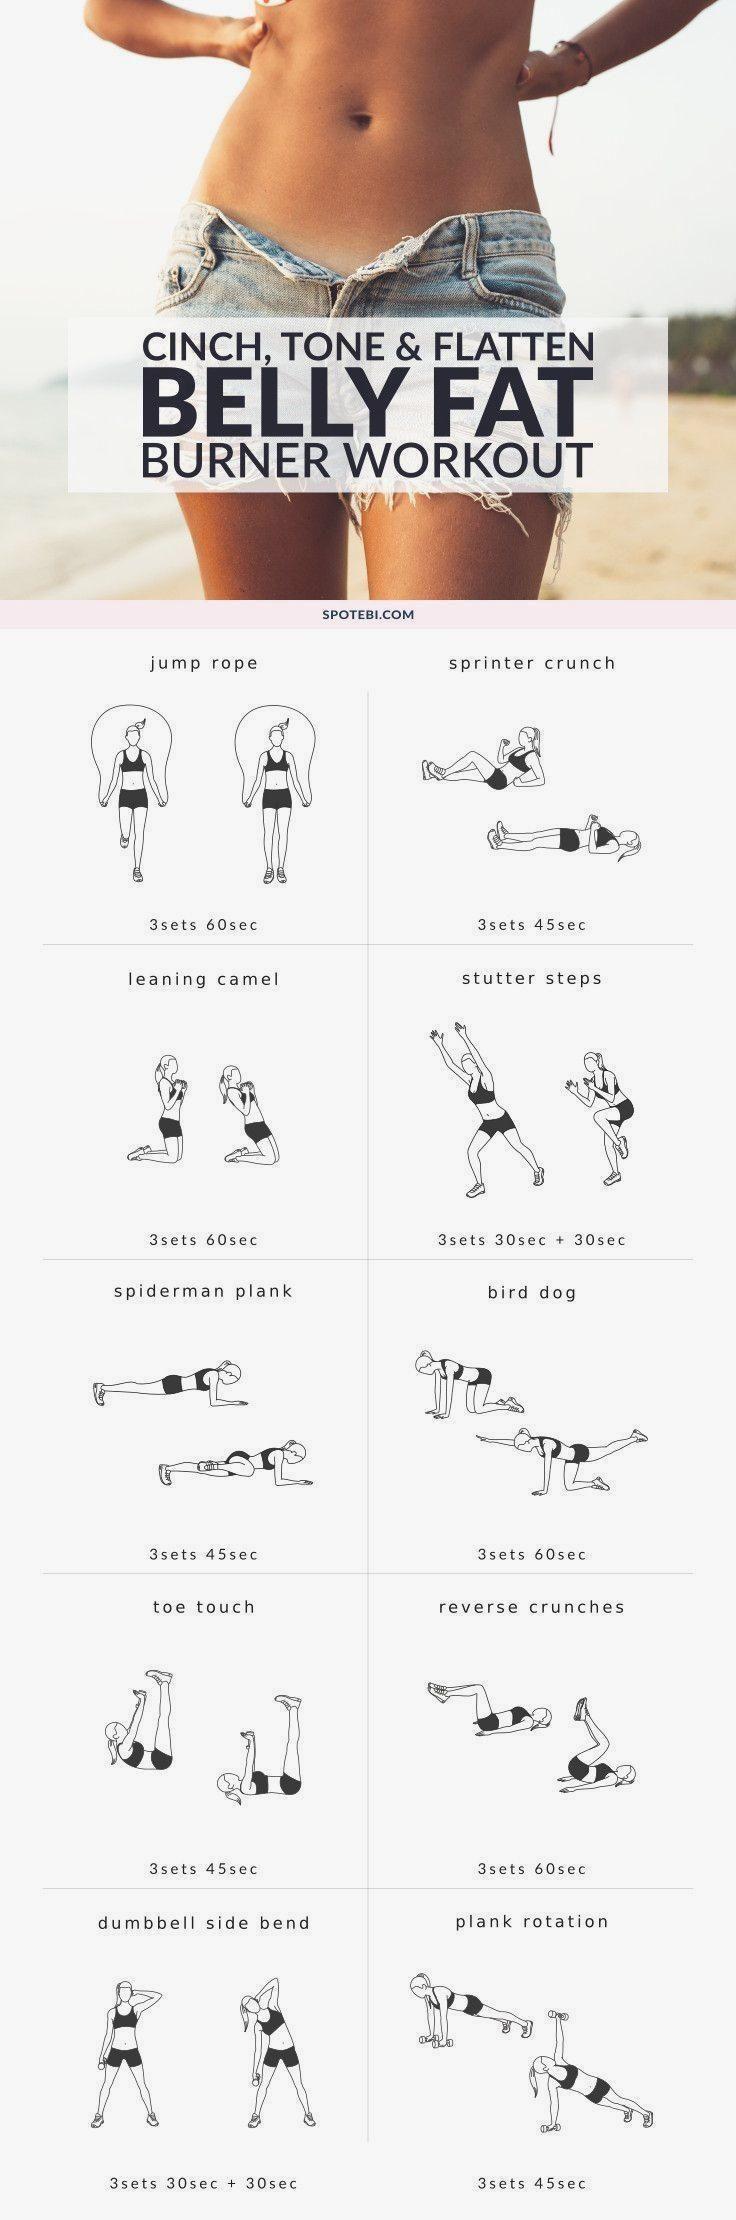 Fitness Motivation : Description Flatten your abs and blast calories with these ... #diet #dietmotiv...